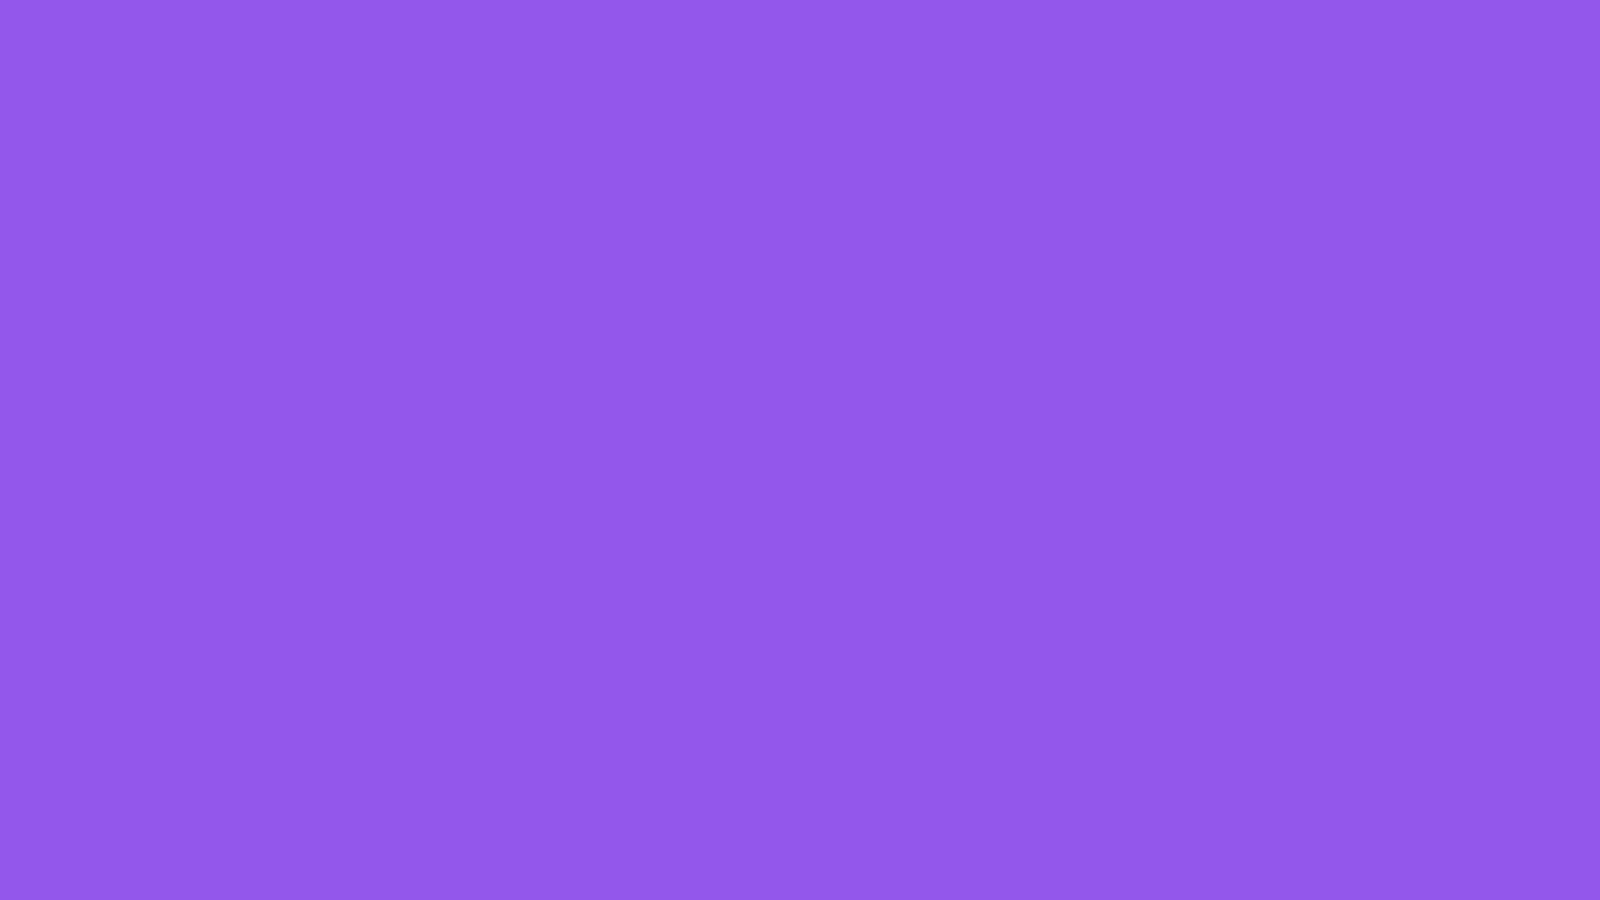 Plain Purple Wallpaper Solid Best Wallpaper Background 1600x900